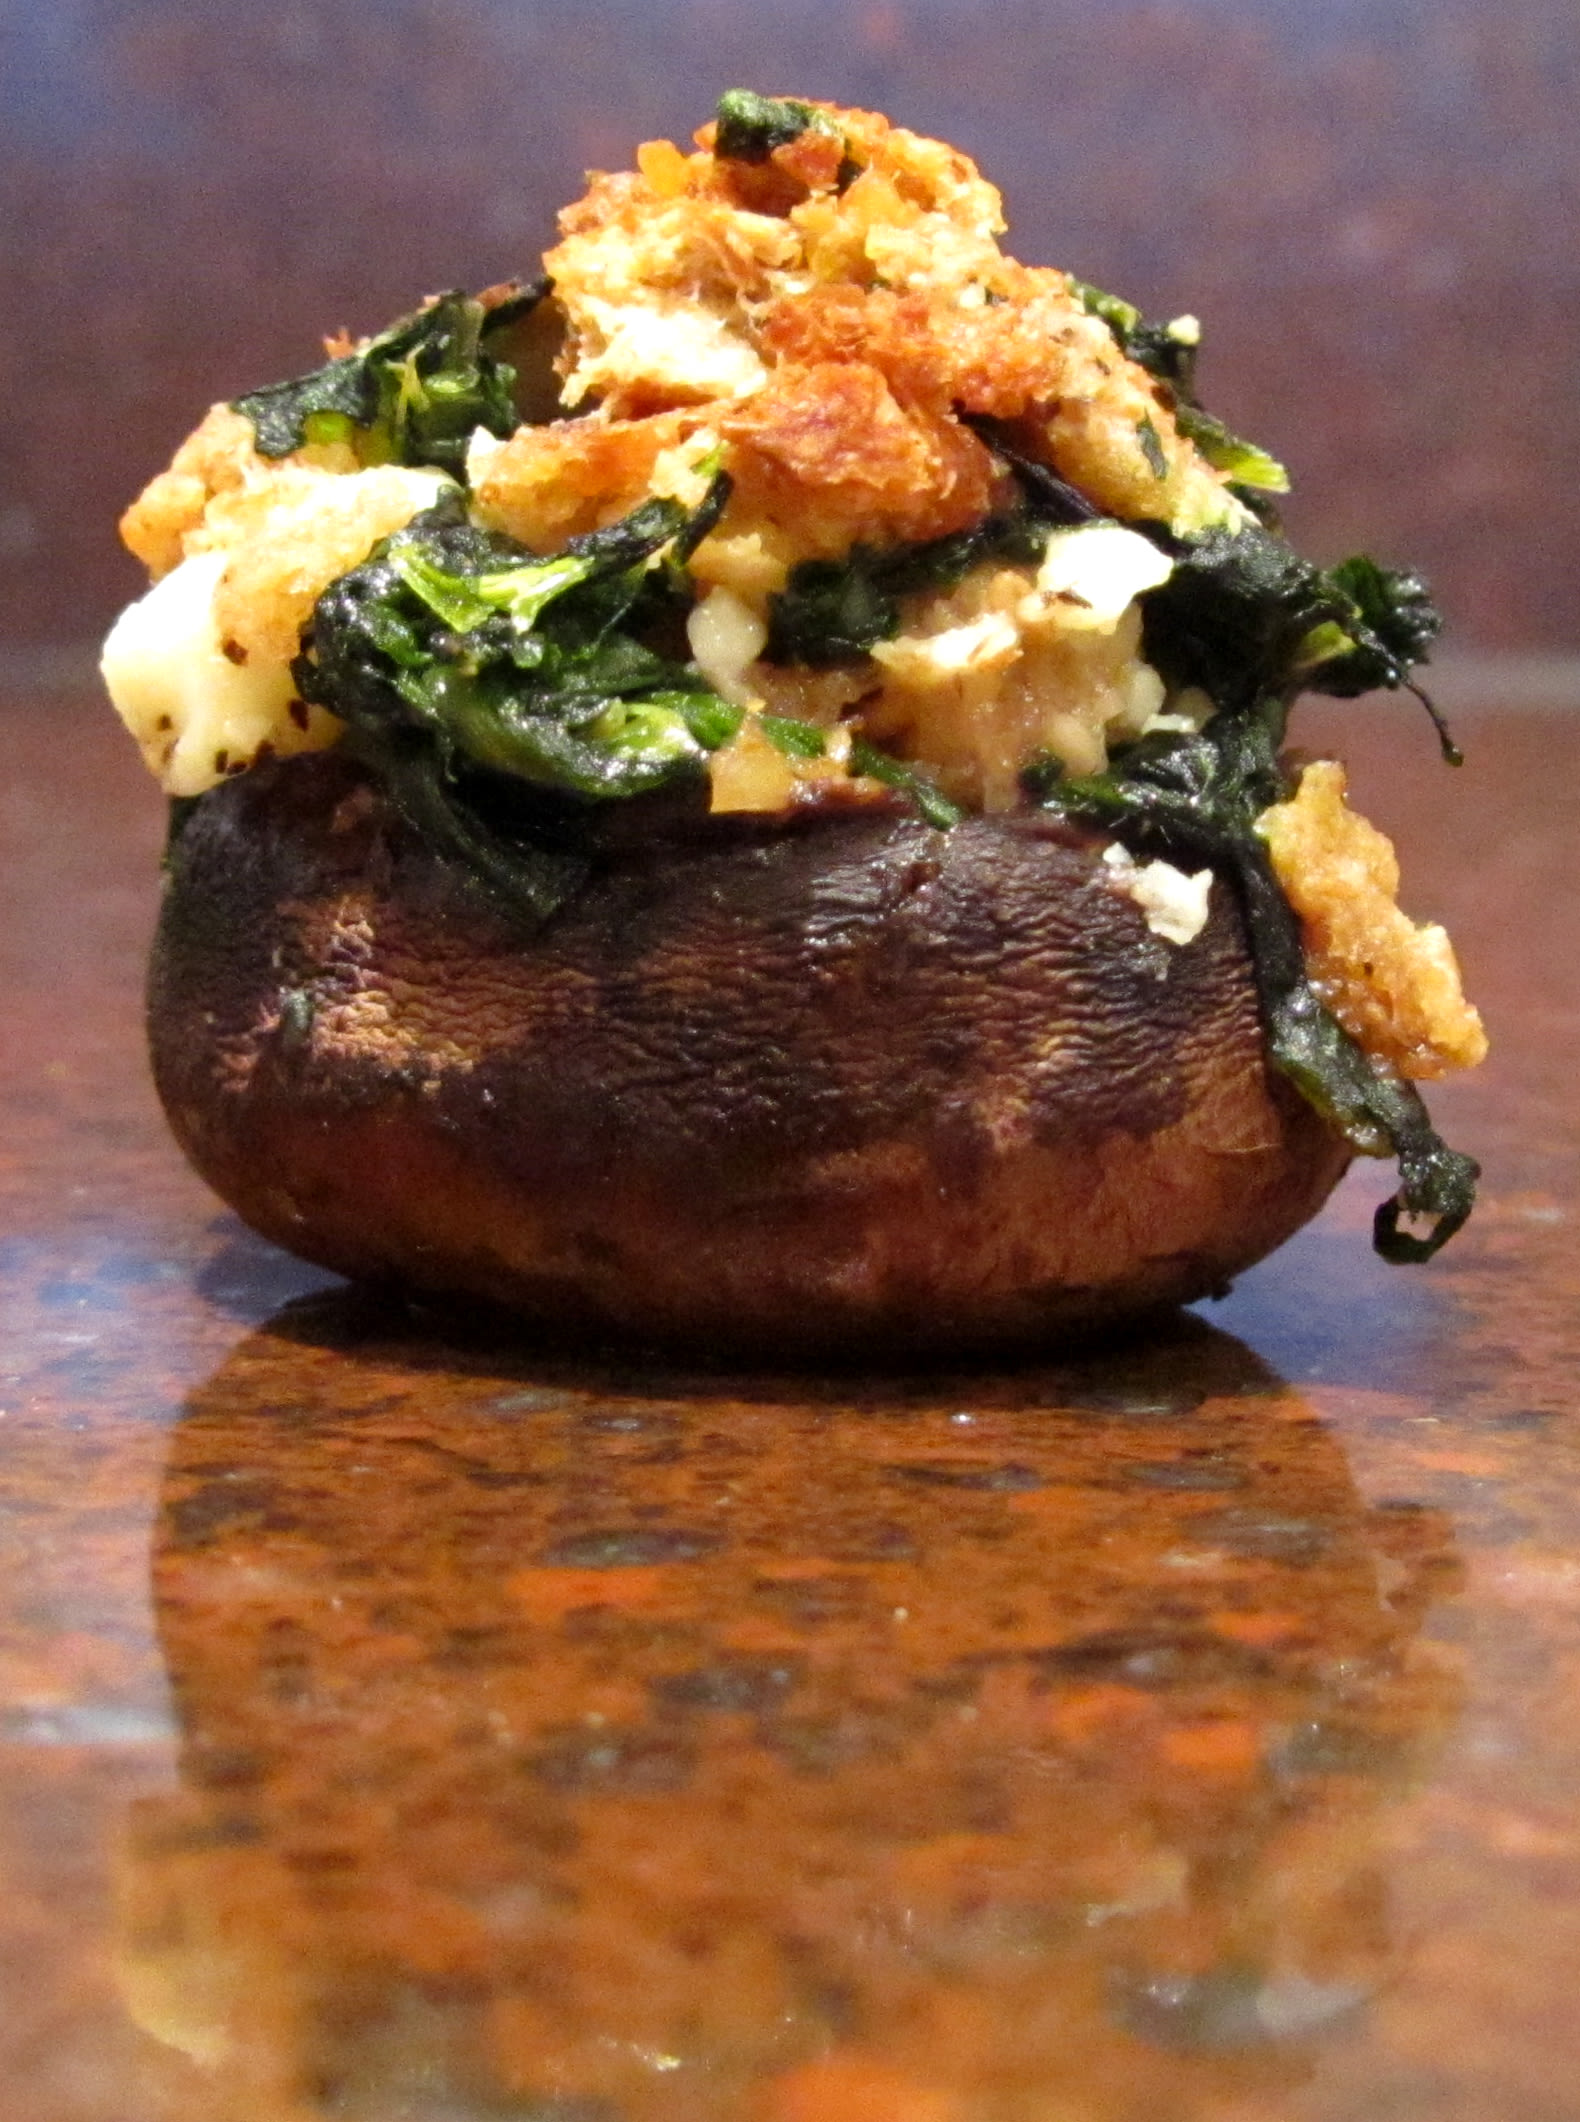 Spinach Stuffed Mushrooms Recipe - Genius Kitchen